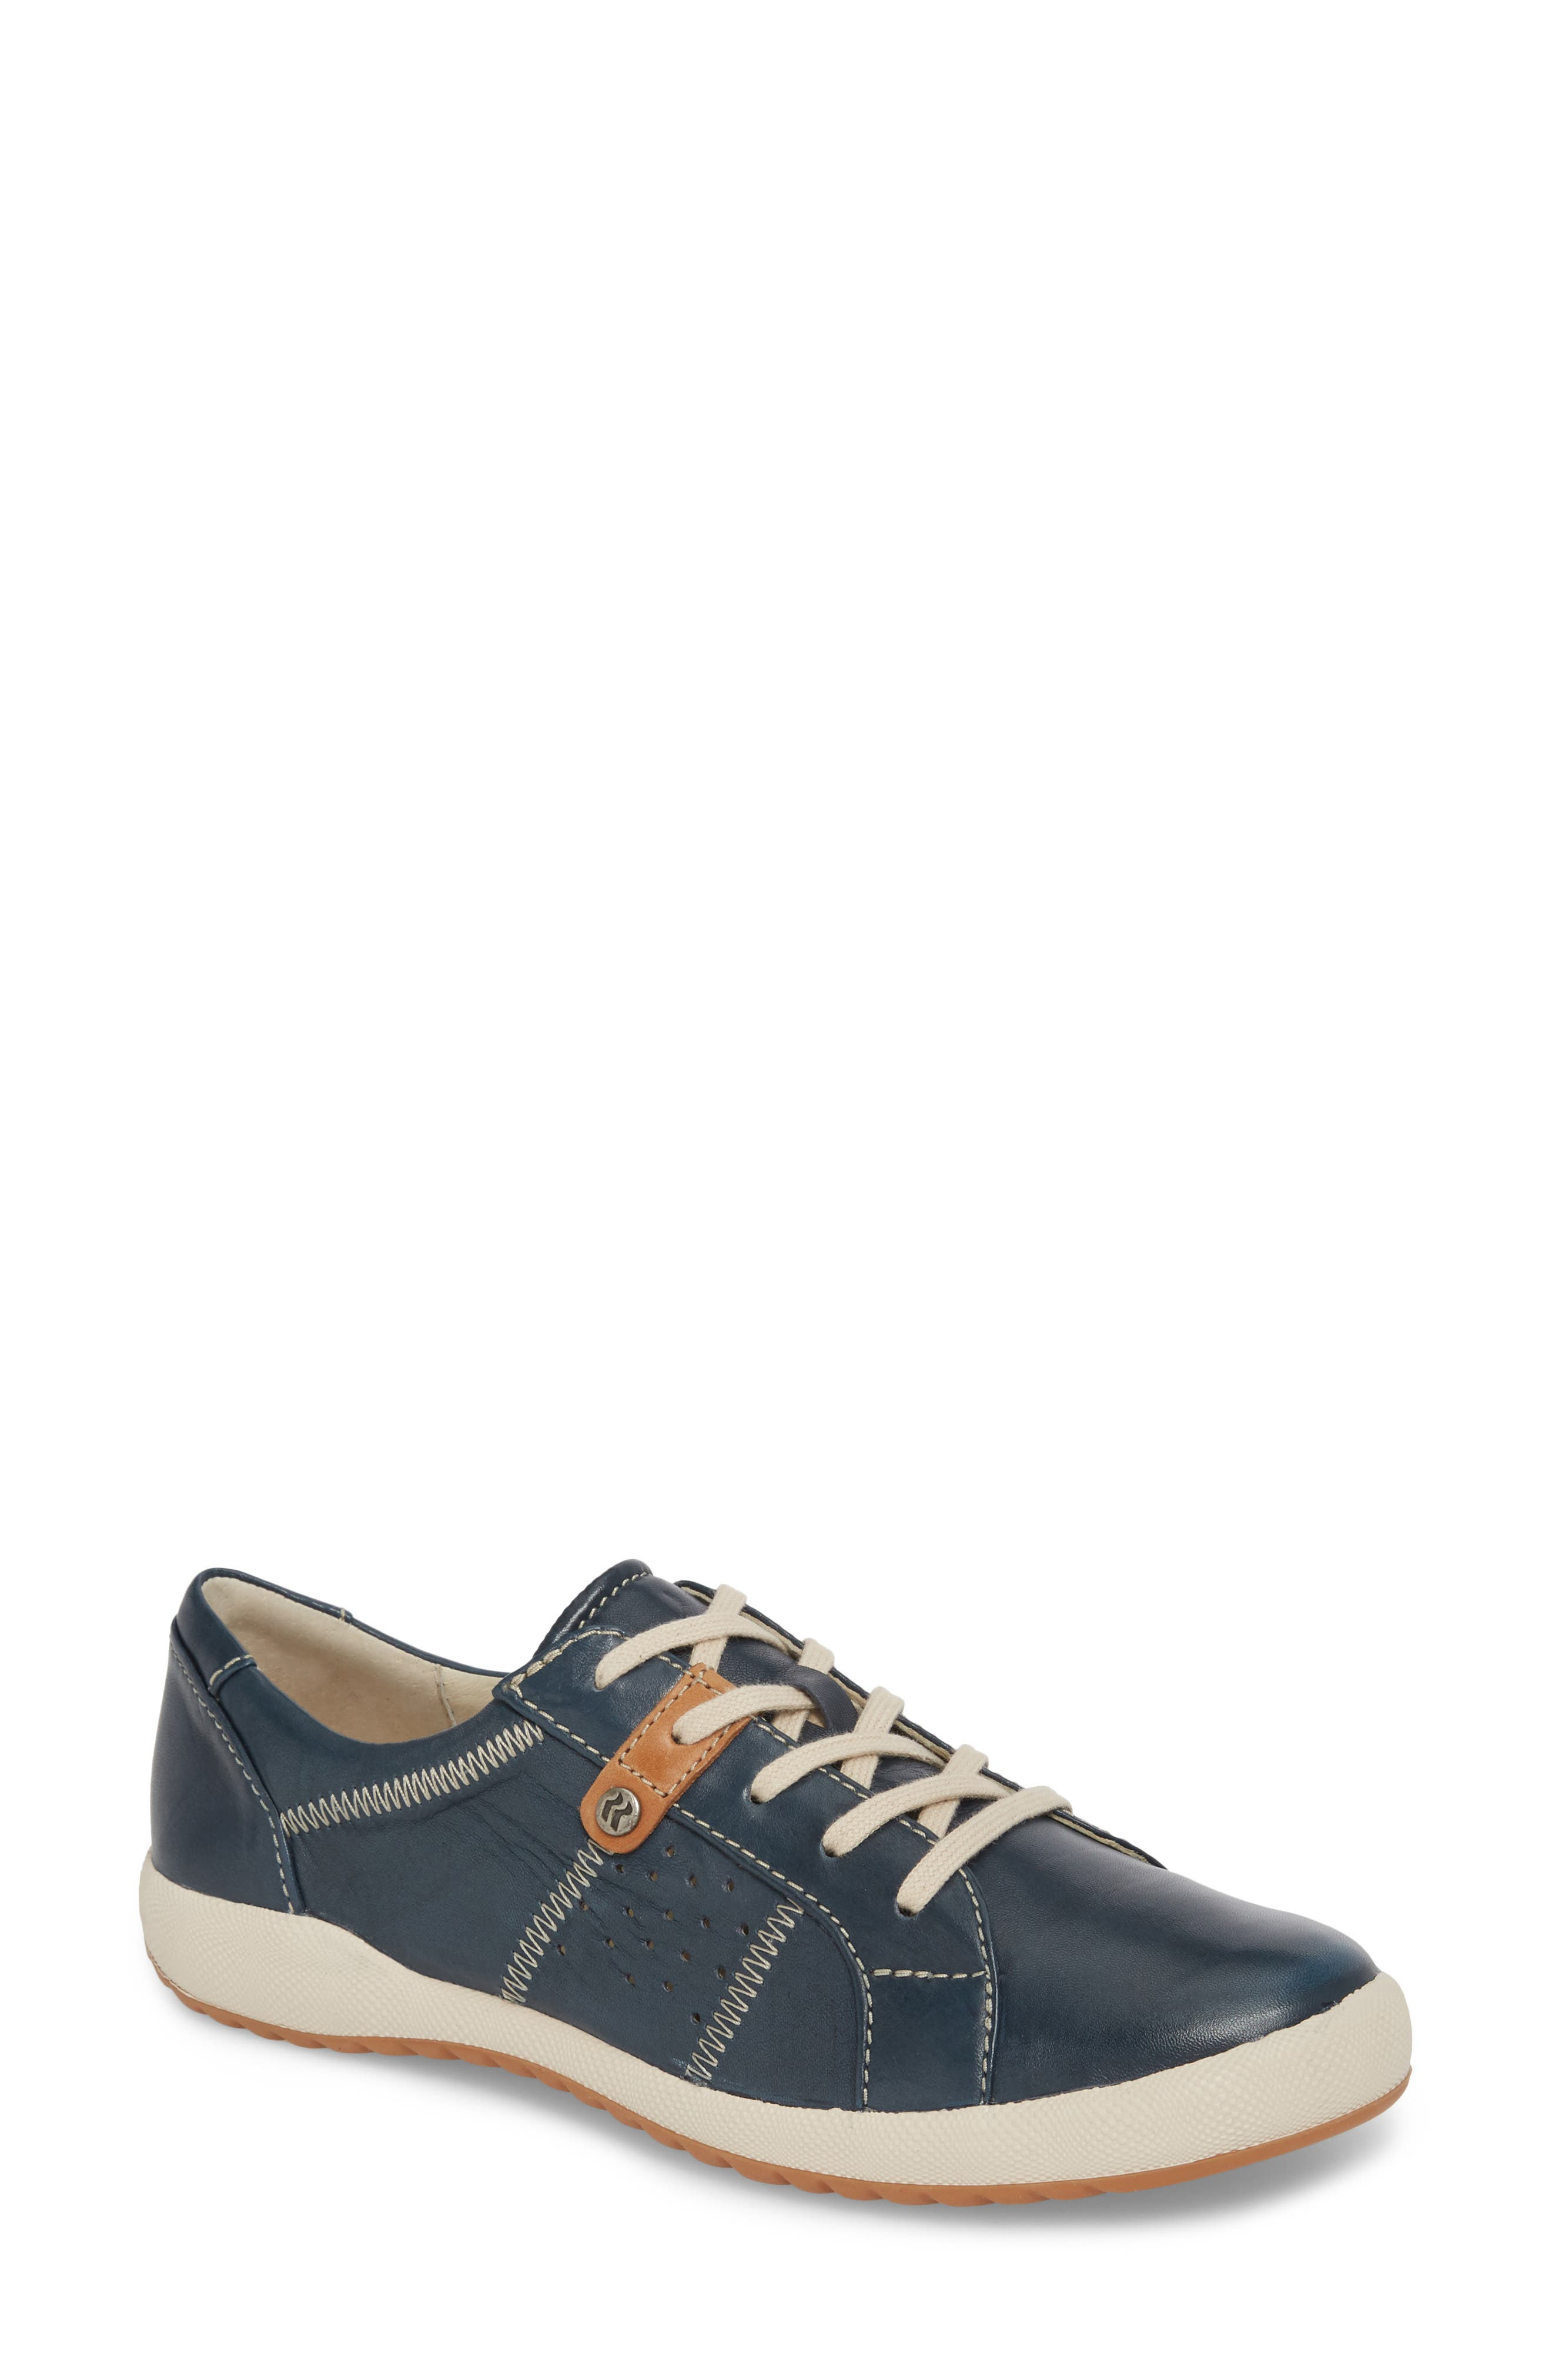 Romika® Cordoba 01 Sneaker (Women)